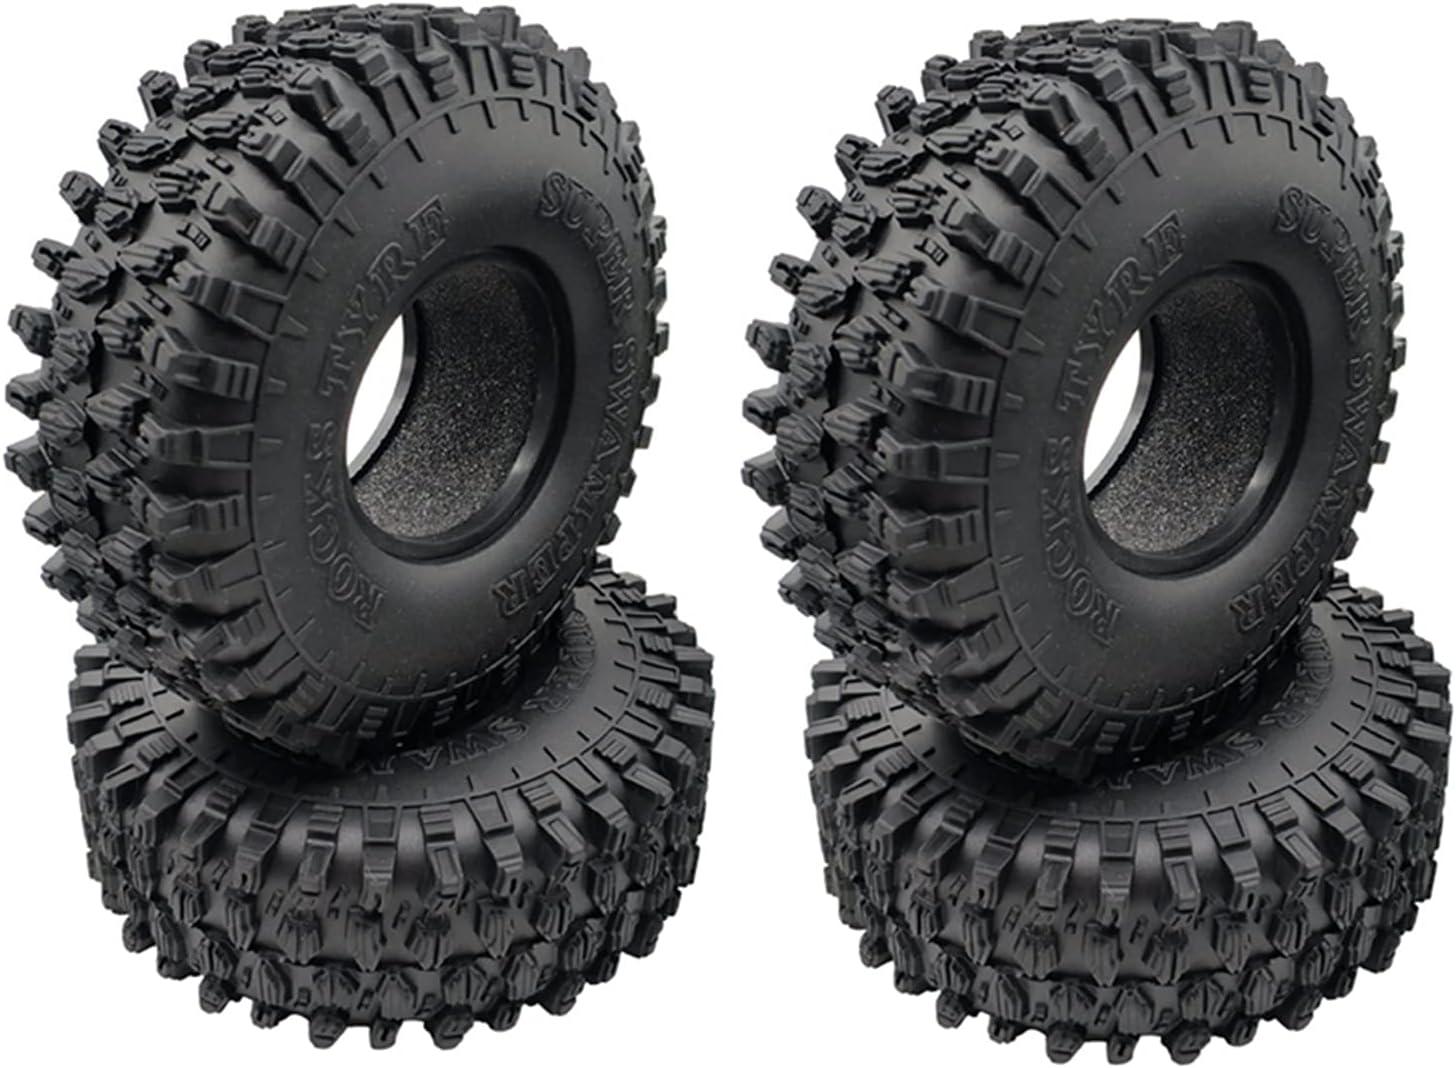 UJETML H Slash Manufacturer direct delivery Tires 4PCS 120MM 1.9 fo Rocks Wheel Tyres Brand new